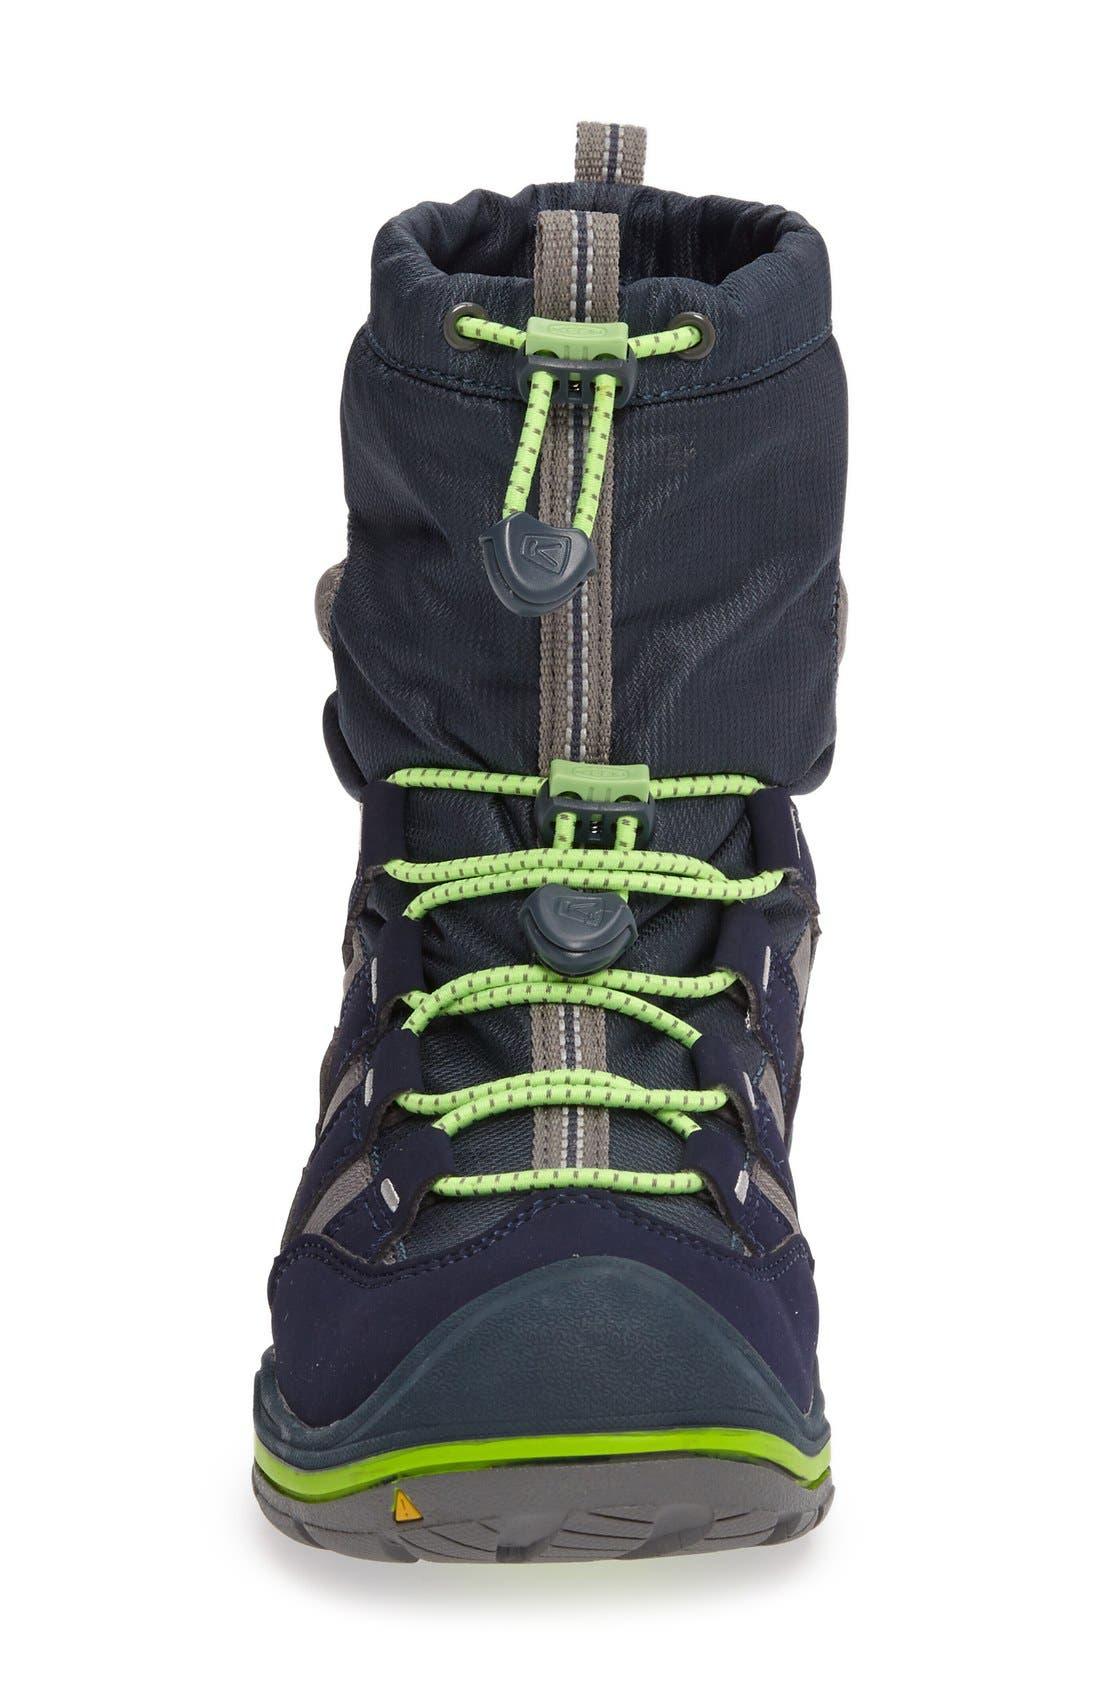 Alternate Image 3  - Keen Winterport II Waterproof Boot (Toddler, Little Kid & Big Kid)